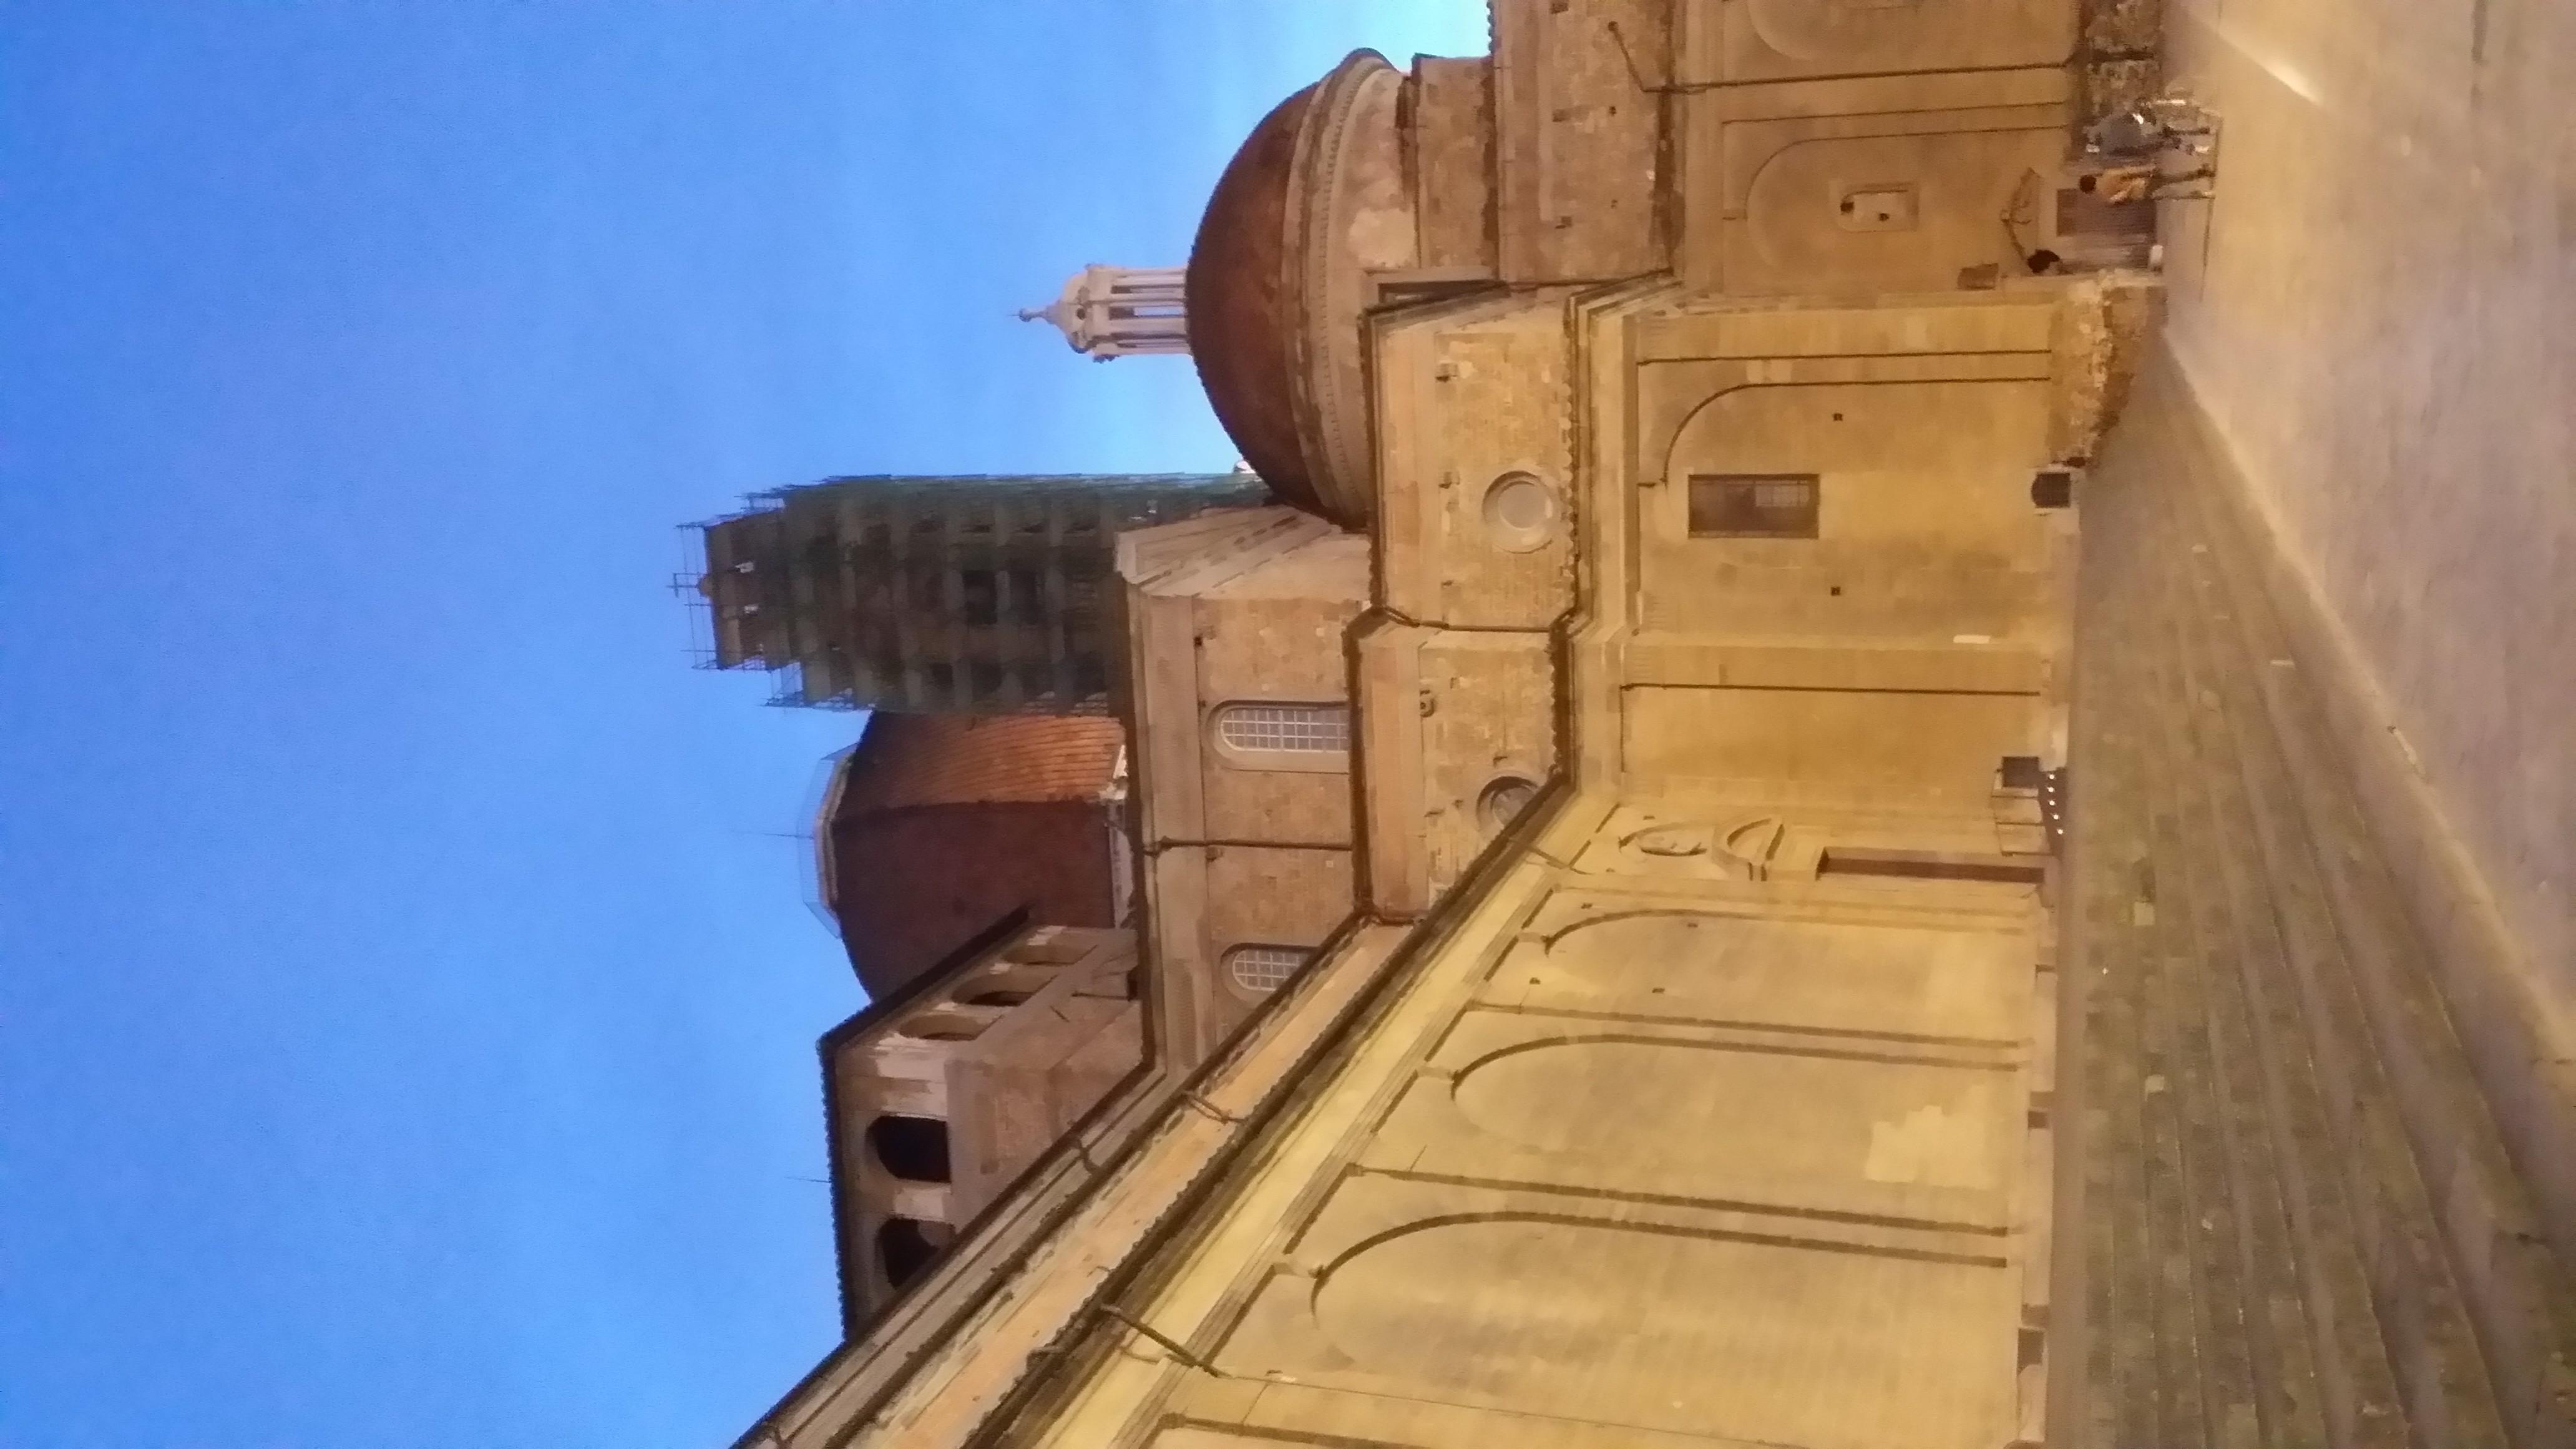 Chapel de Medici (Florence)